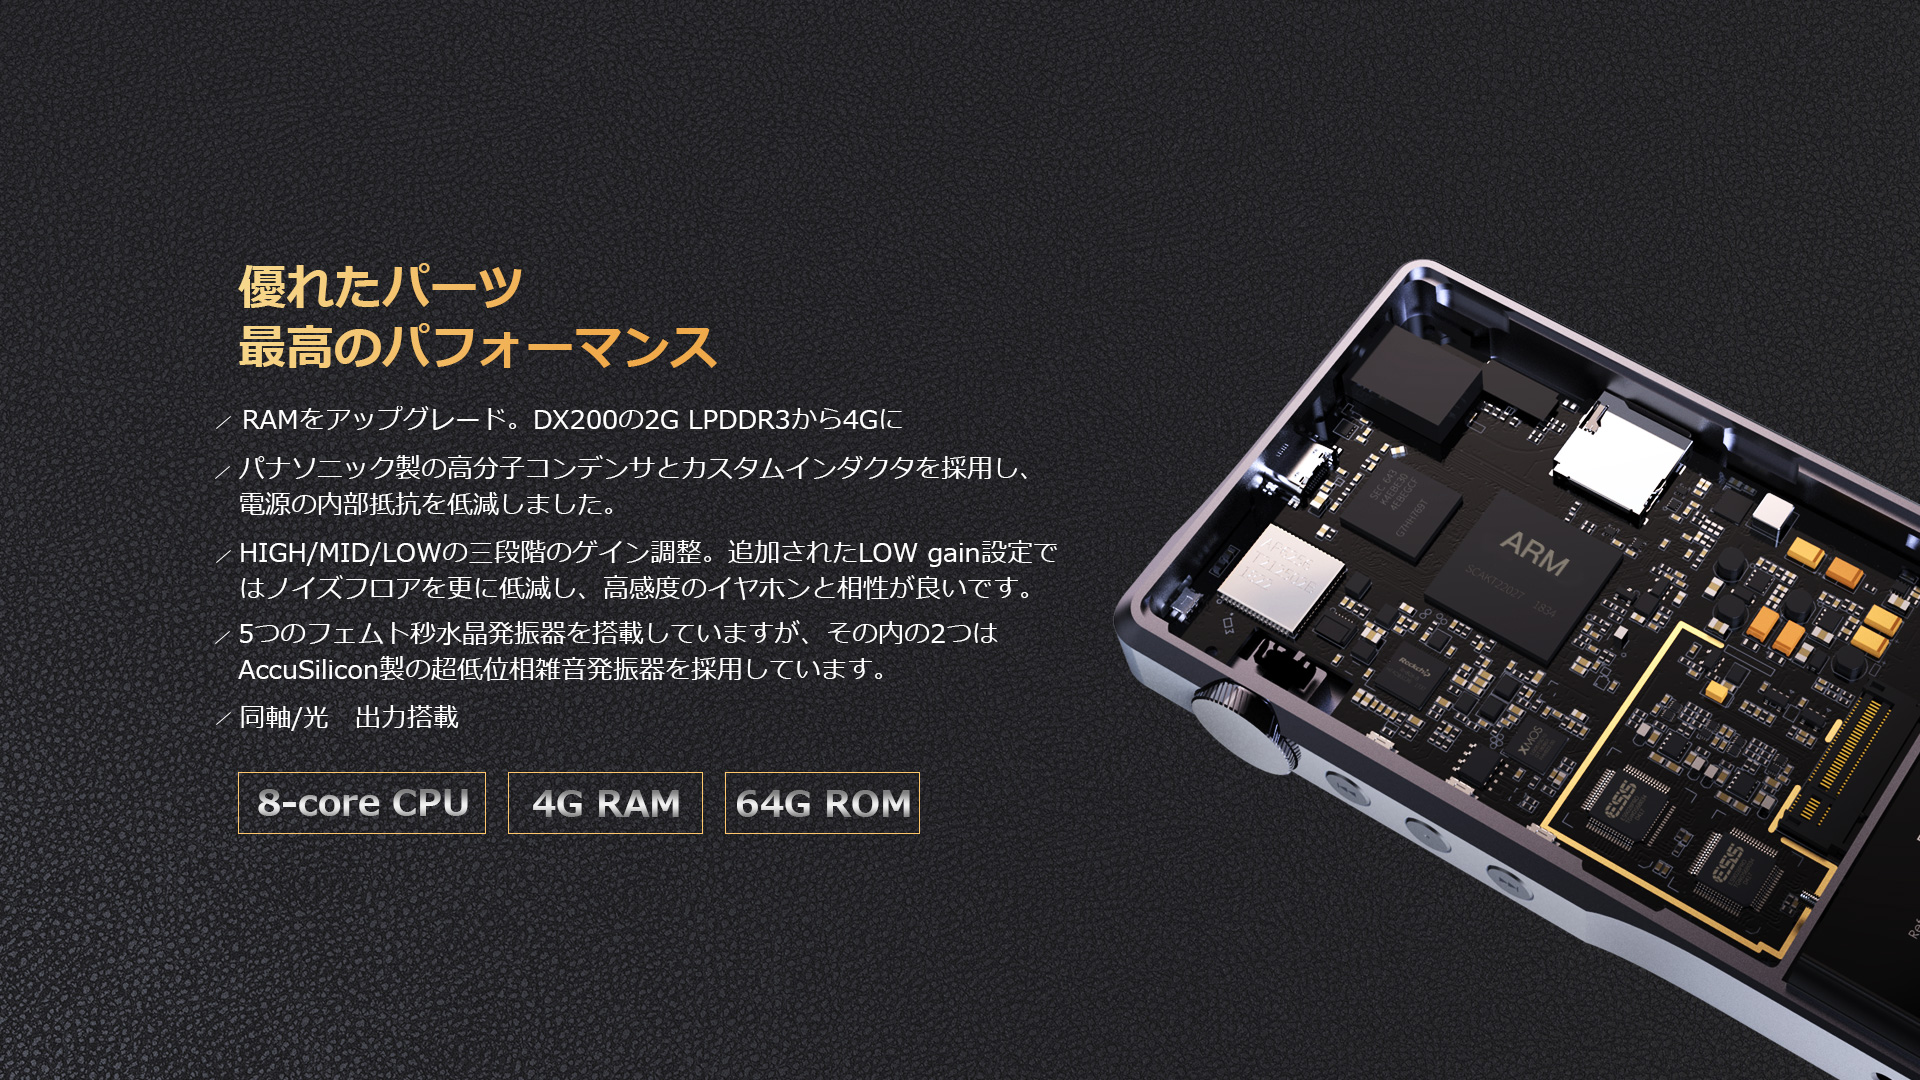 iBasso Audio DX220 《iBassoオリジナルマグプレゼント》